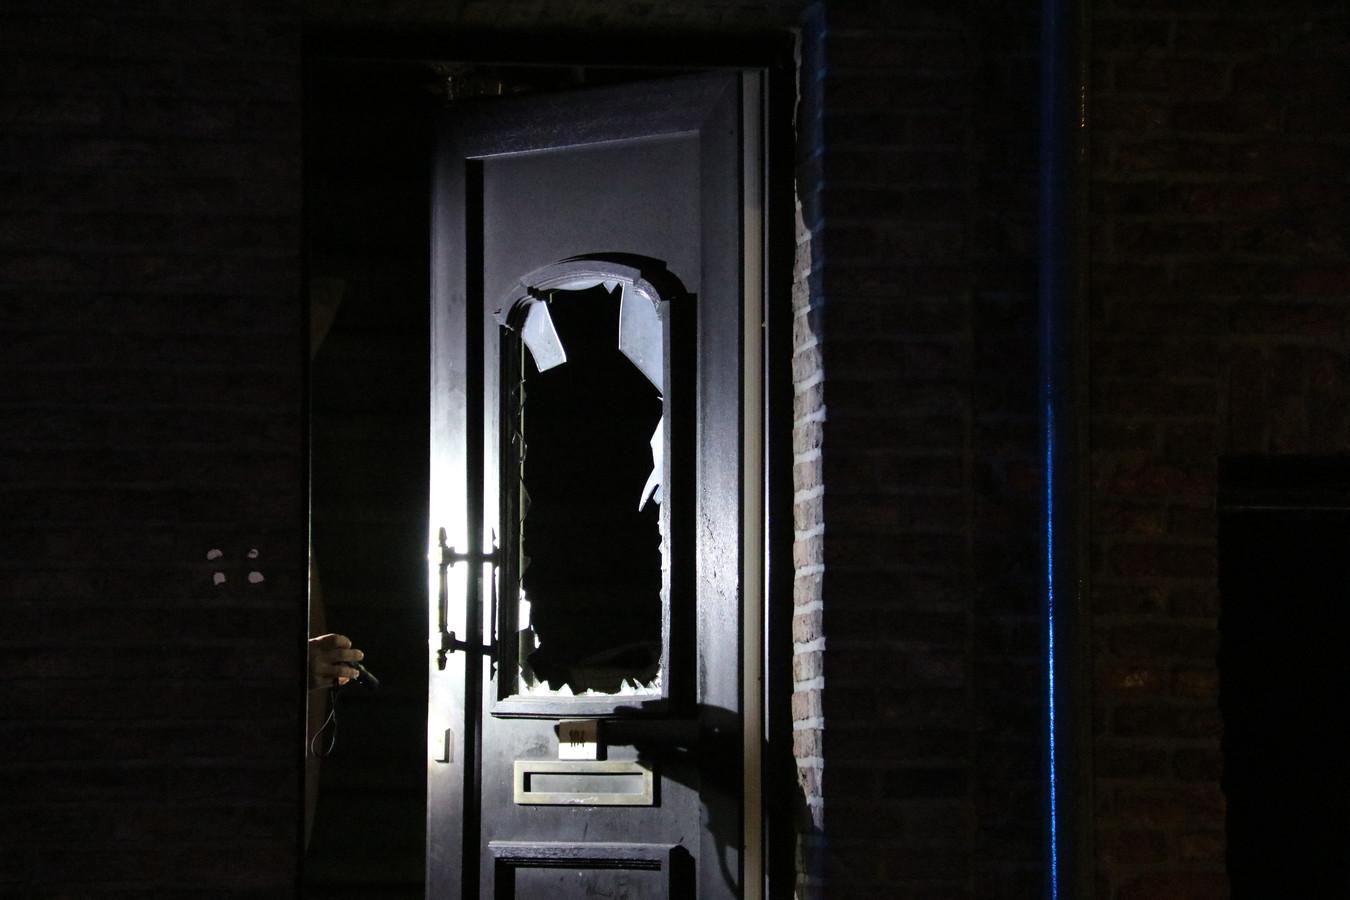 Het raam in de voordeur sneuvelde.